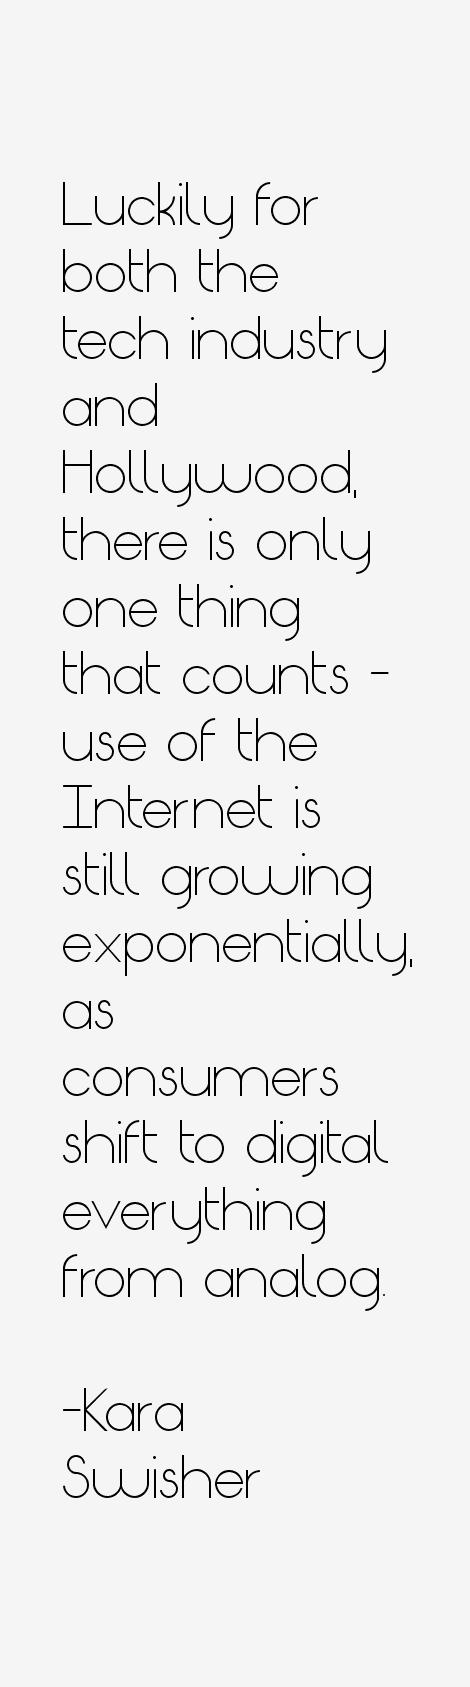 Kara Swisher Quotes